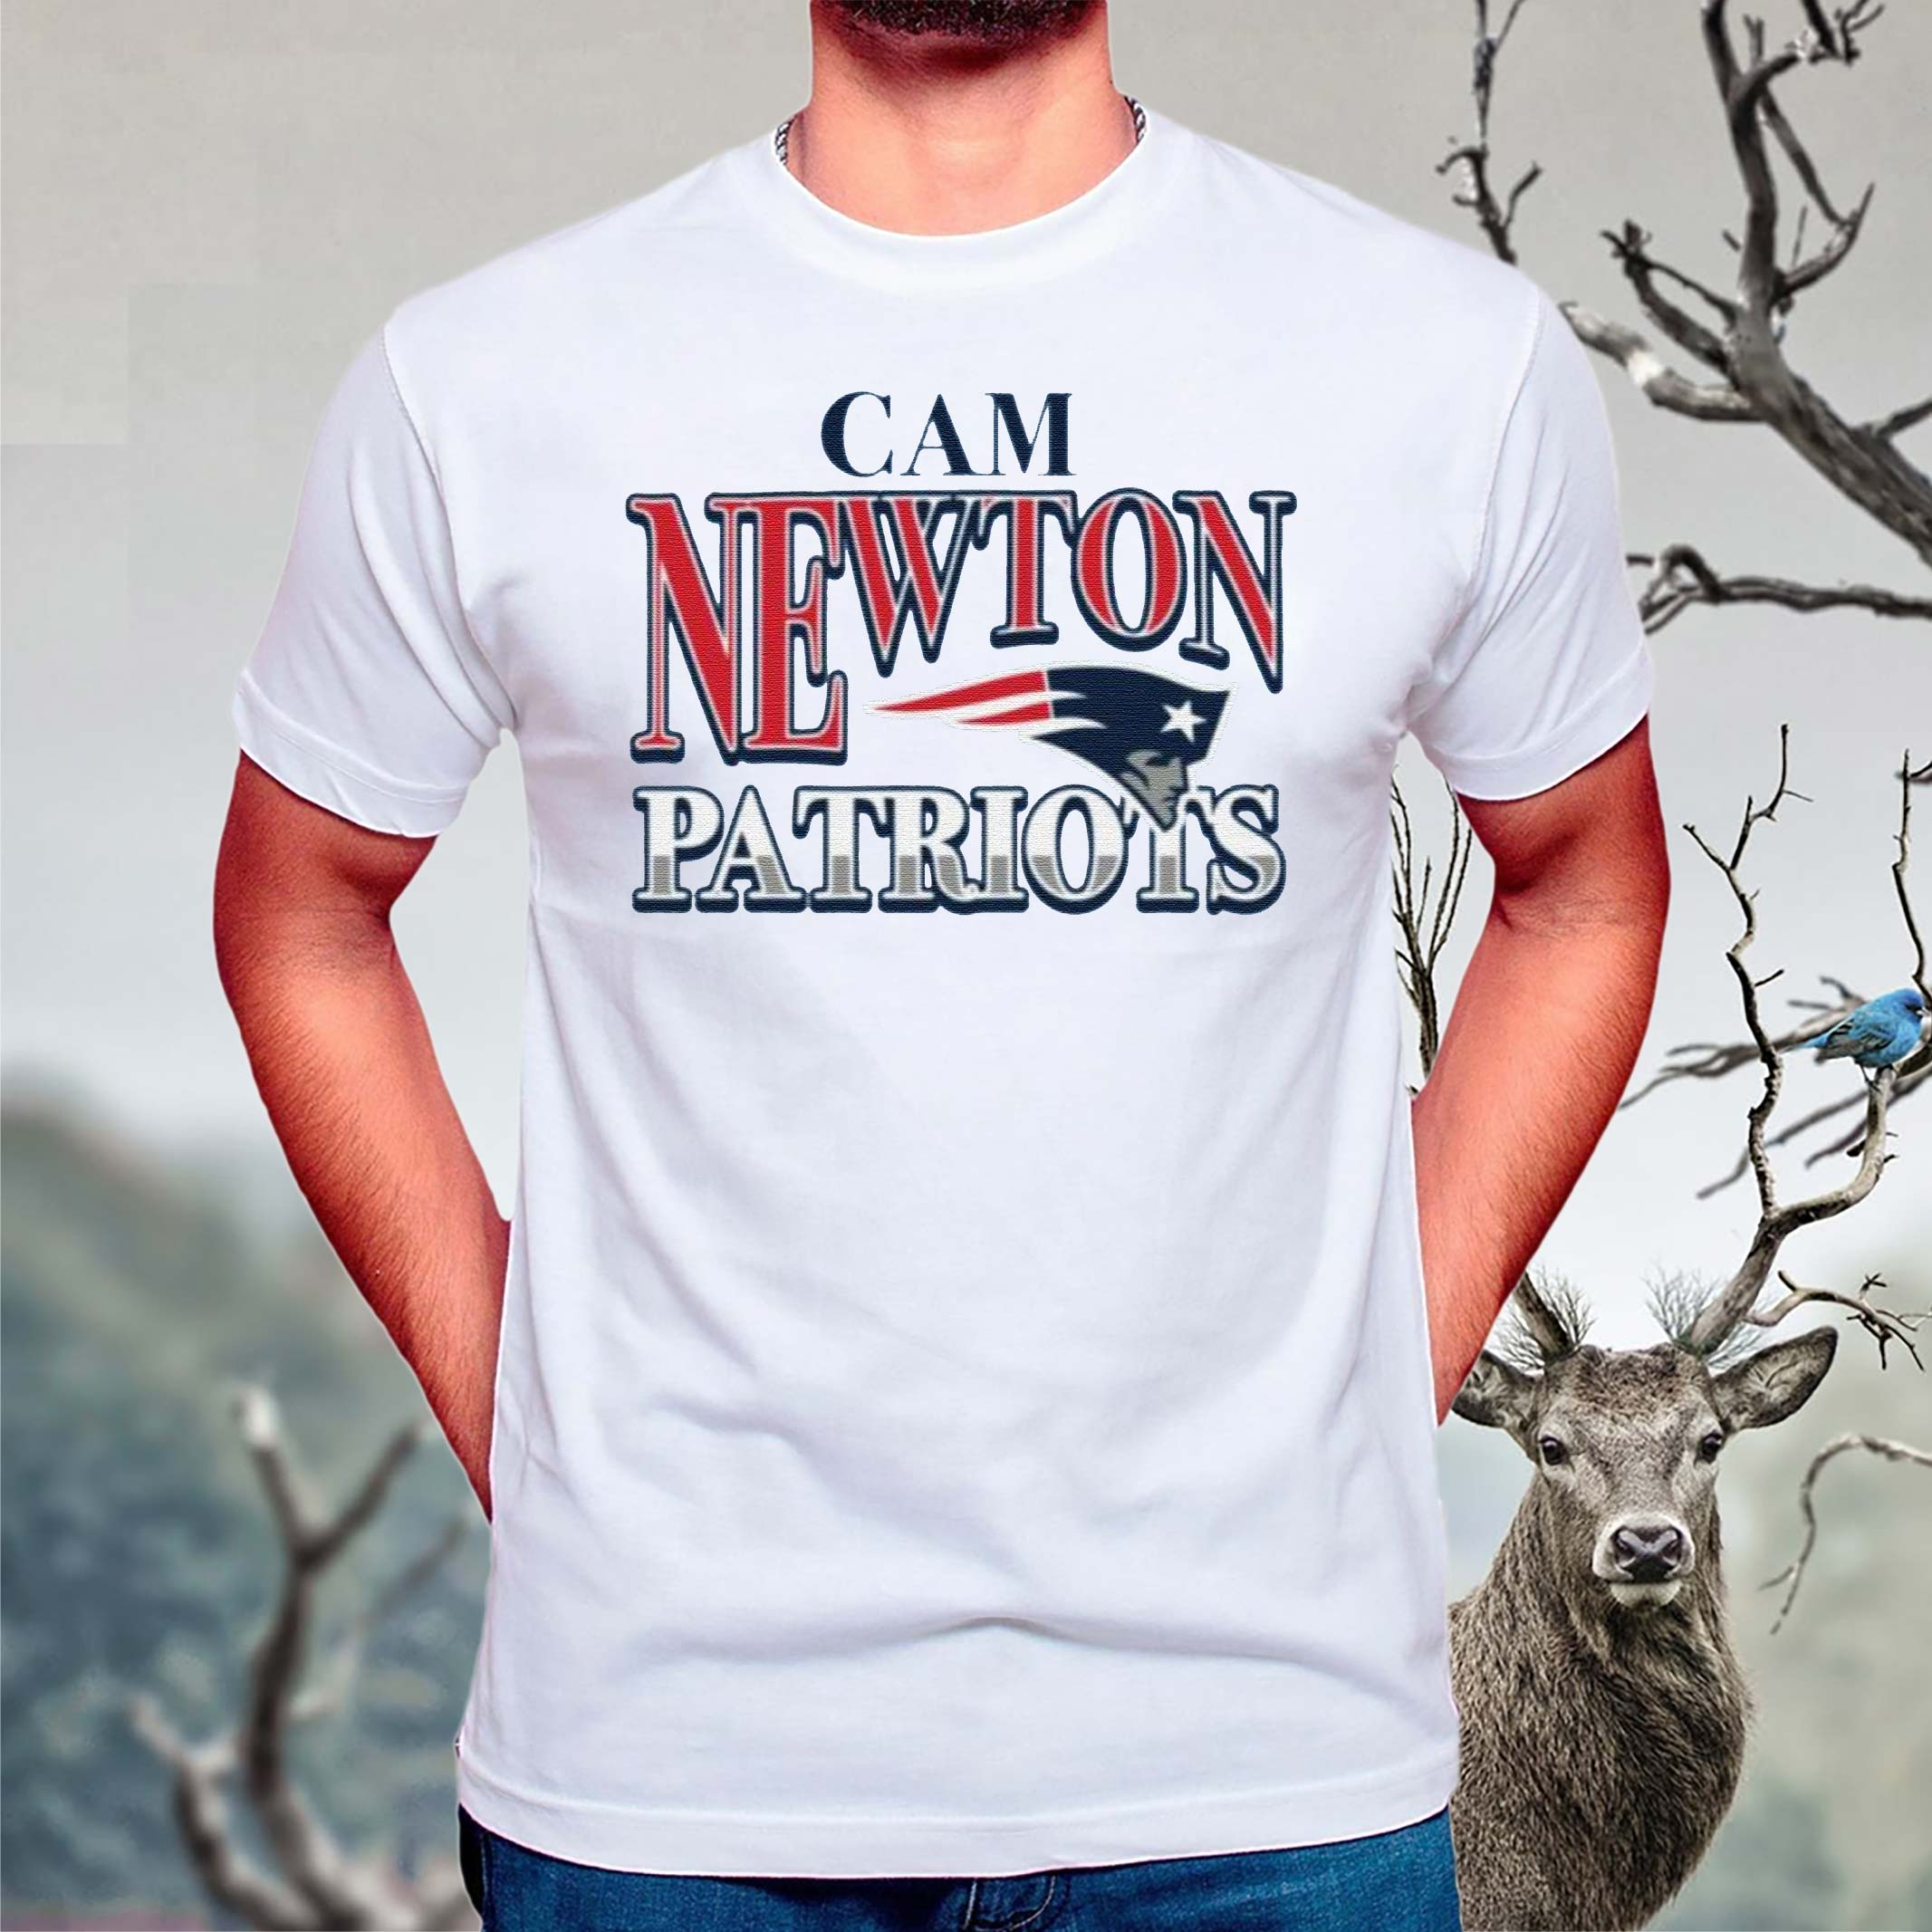 New-England-Patriots-Cam-Newton-T-Shirts